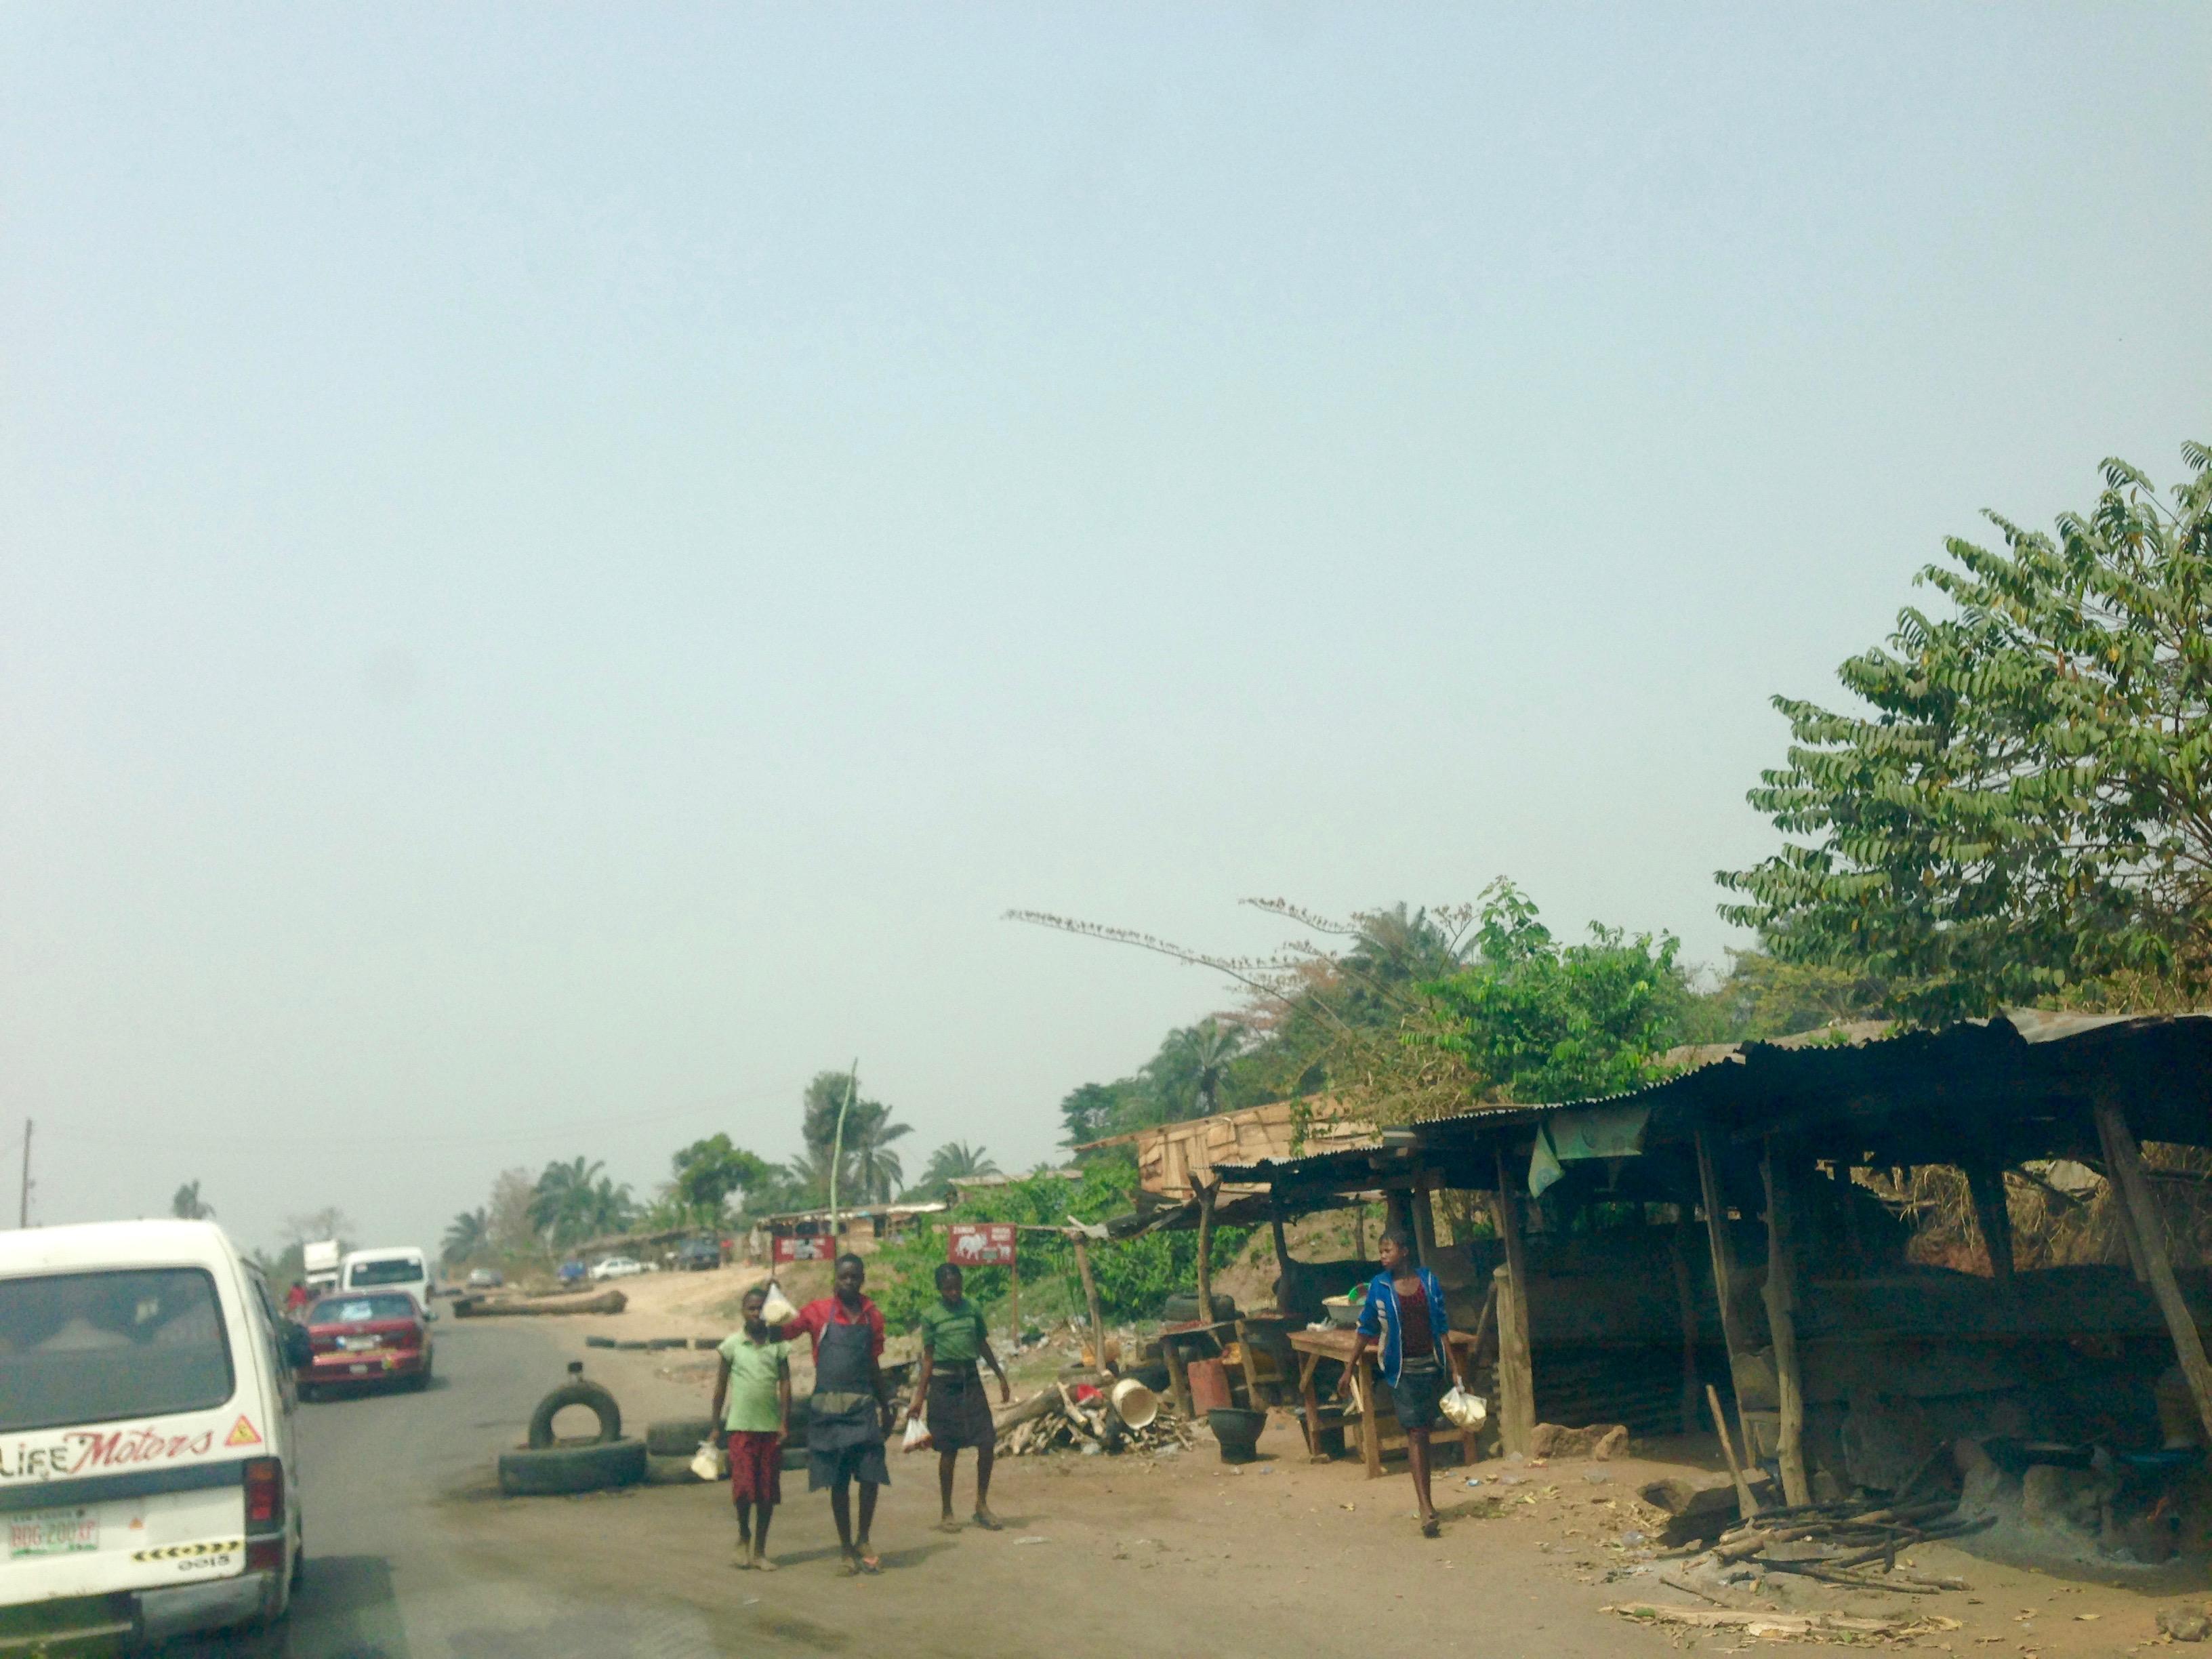 Children roadside hawking fried yams, Ibillo, Edo, Nigeria. #JujuFilms